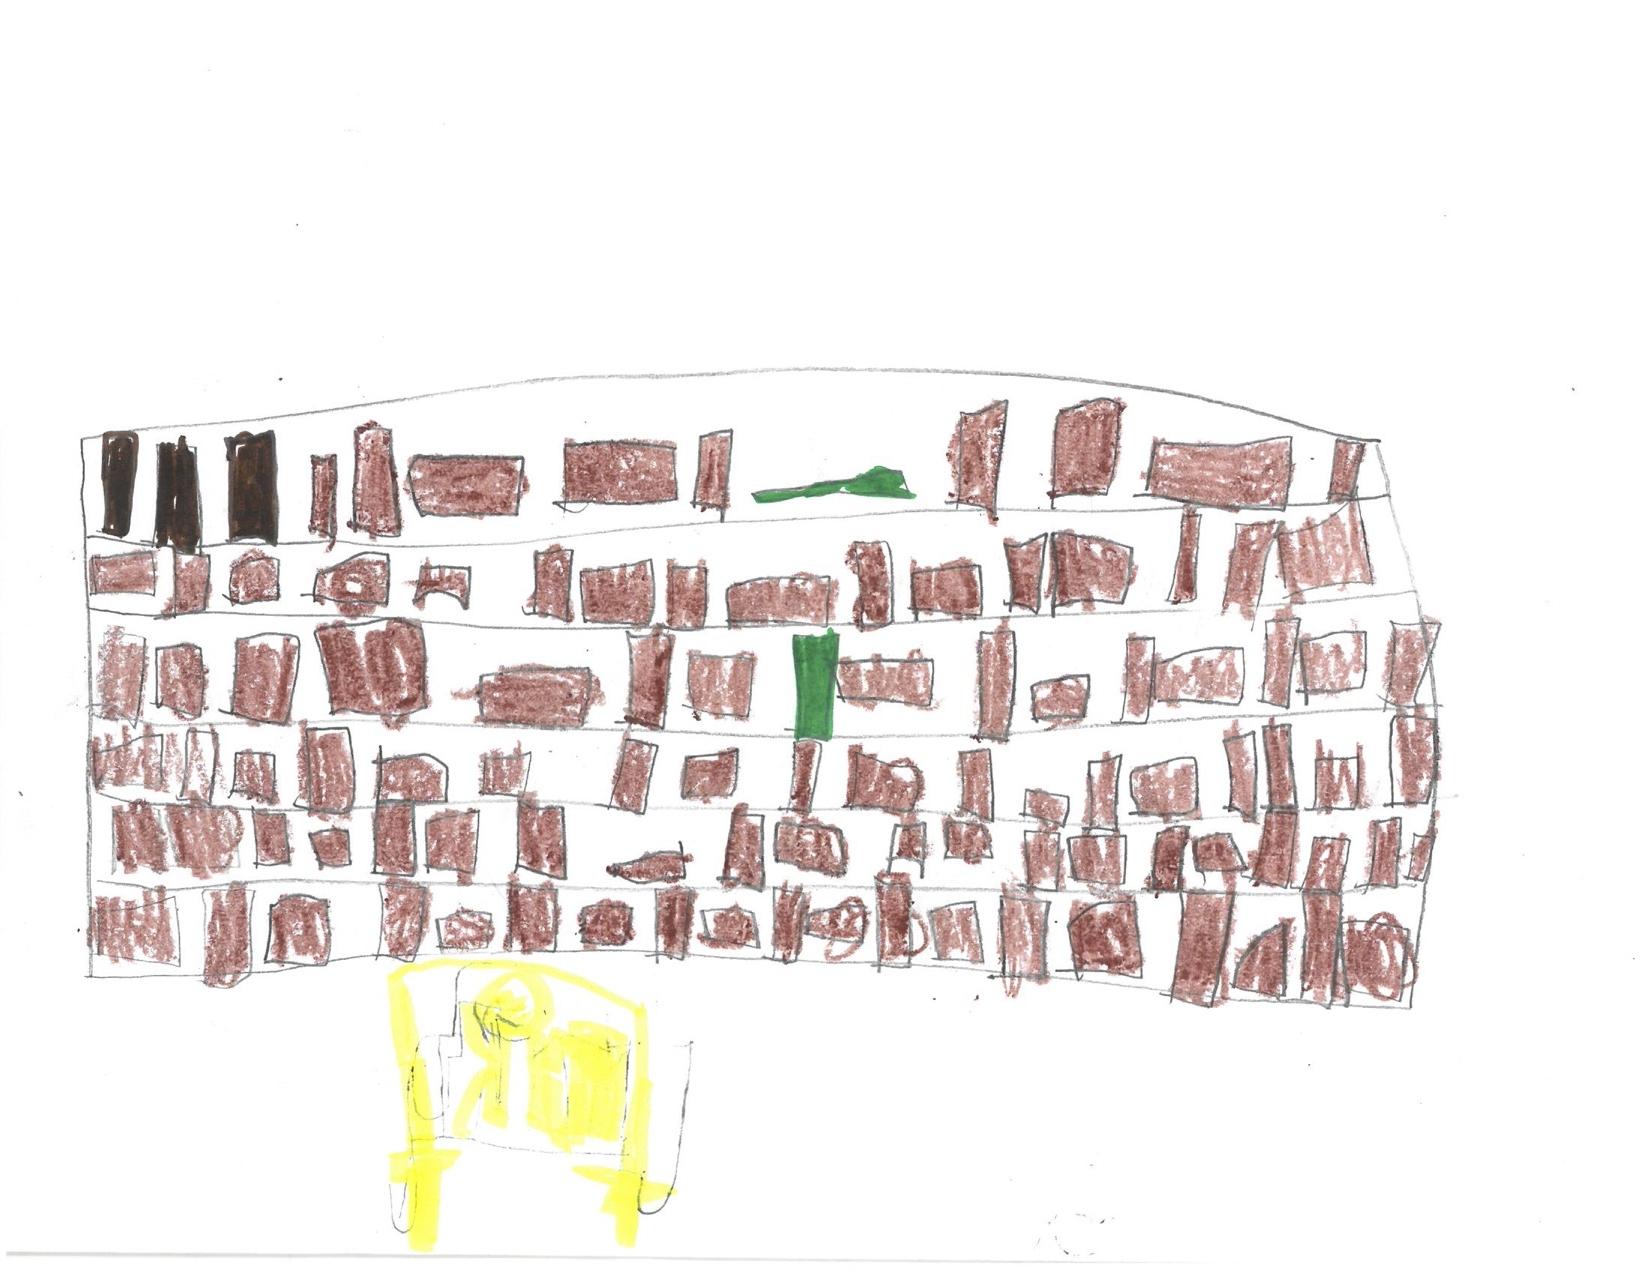 By Tyler, 2nd Grade